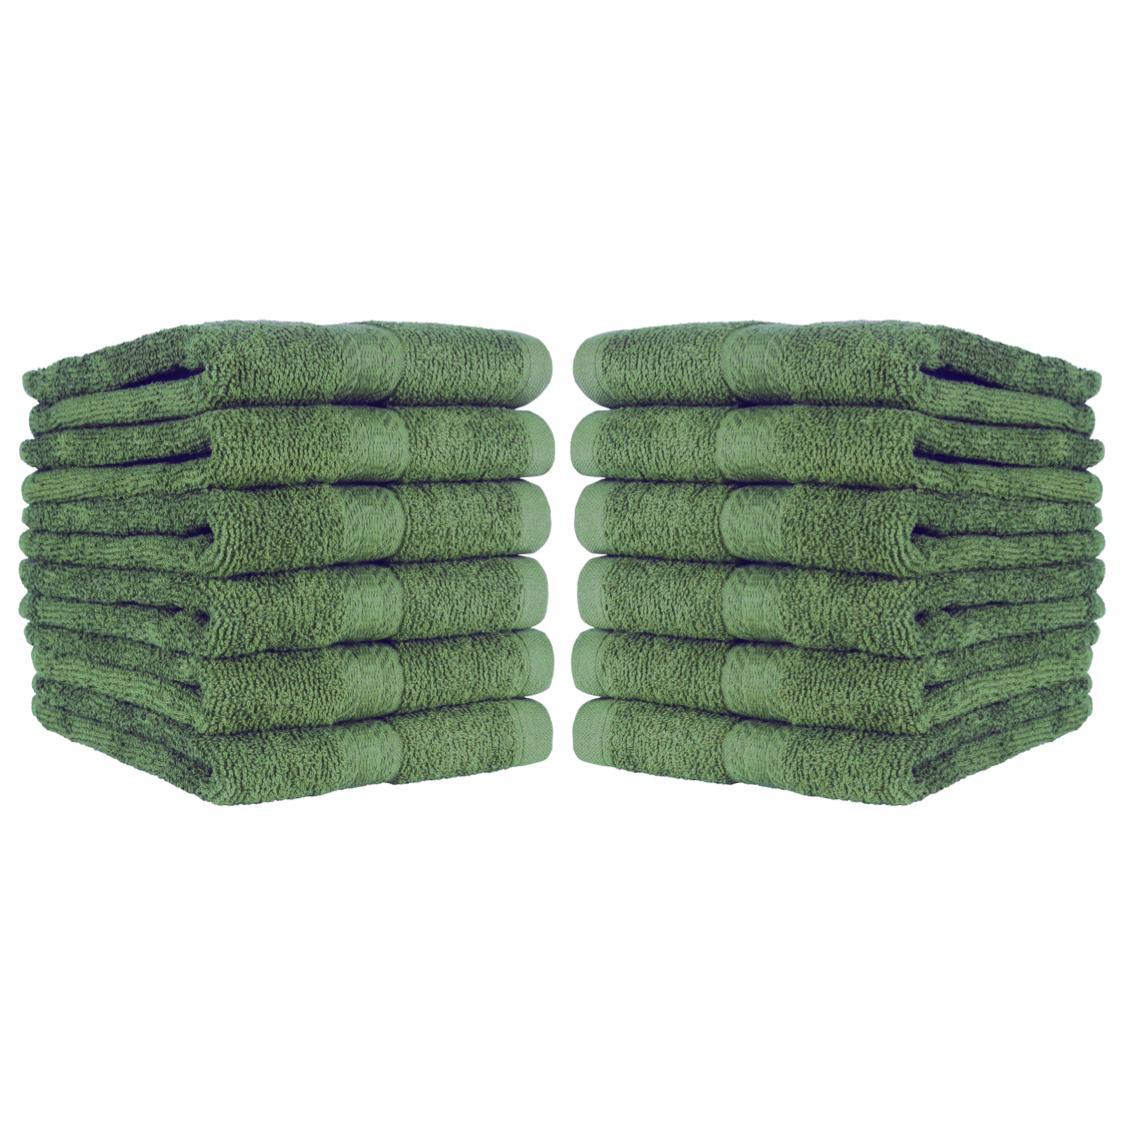 12 Pack of Bathroom Hand Ring-Spun 16 27